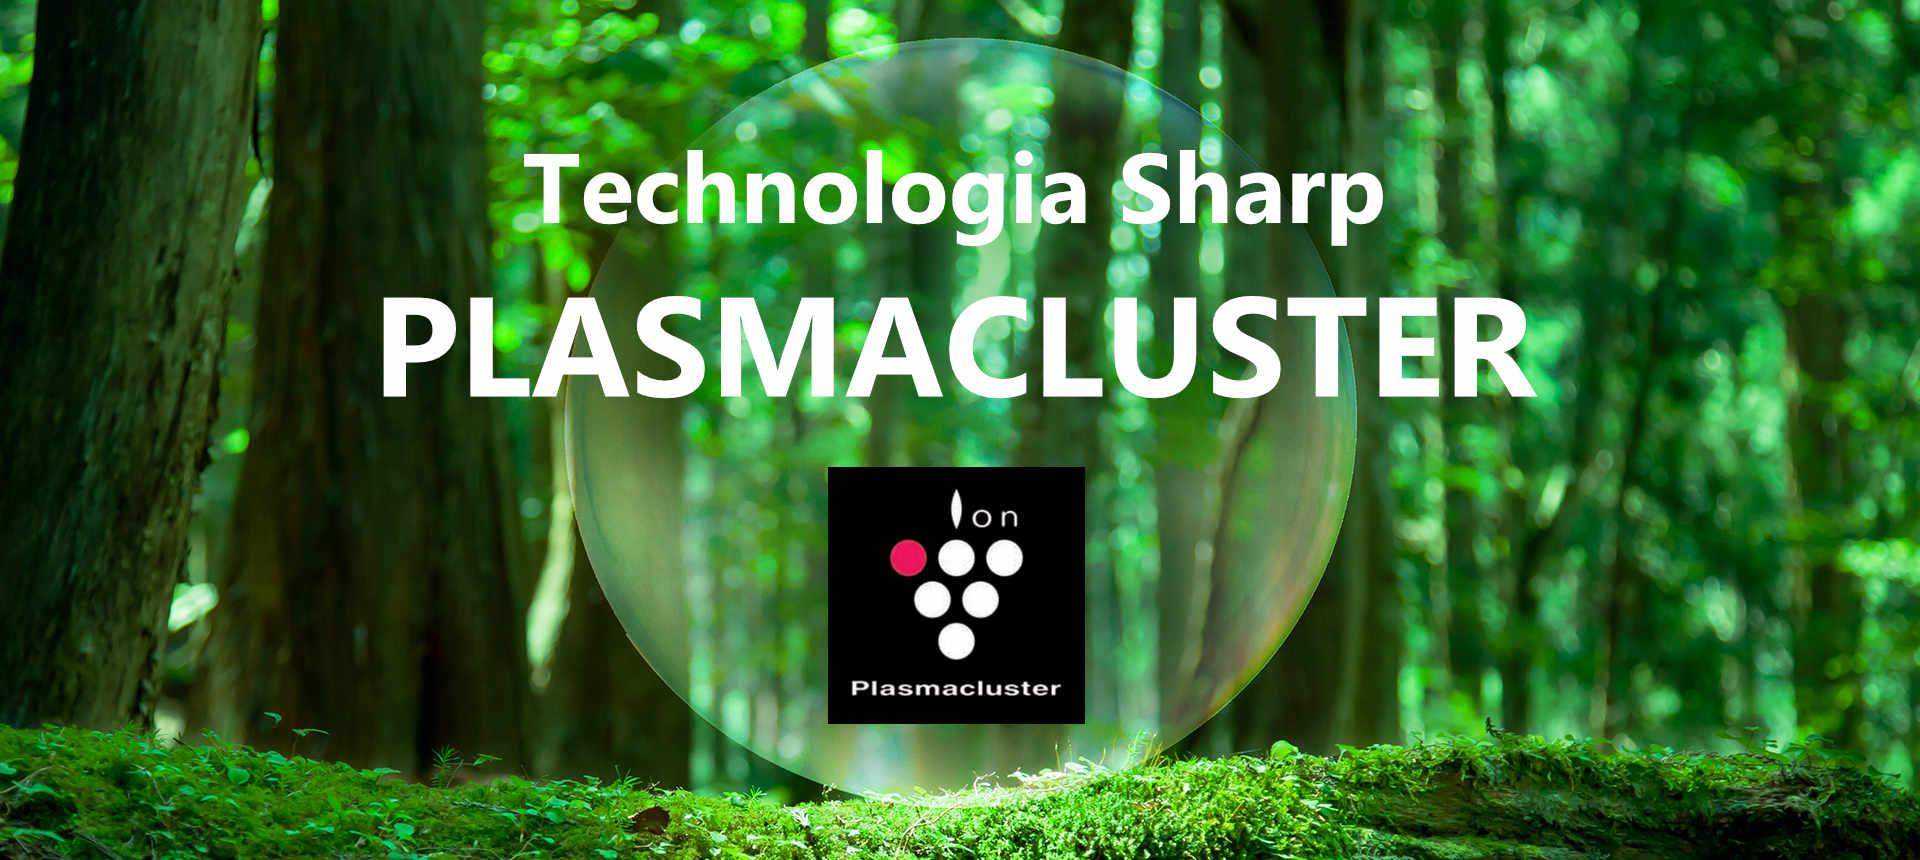 Technologia Plasmacluster naturalne jony